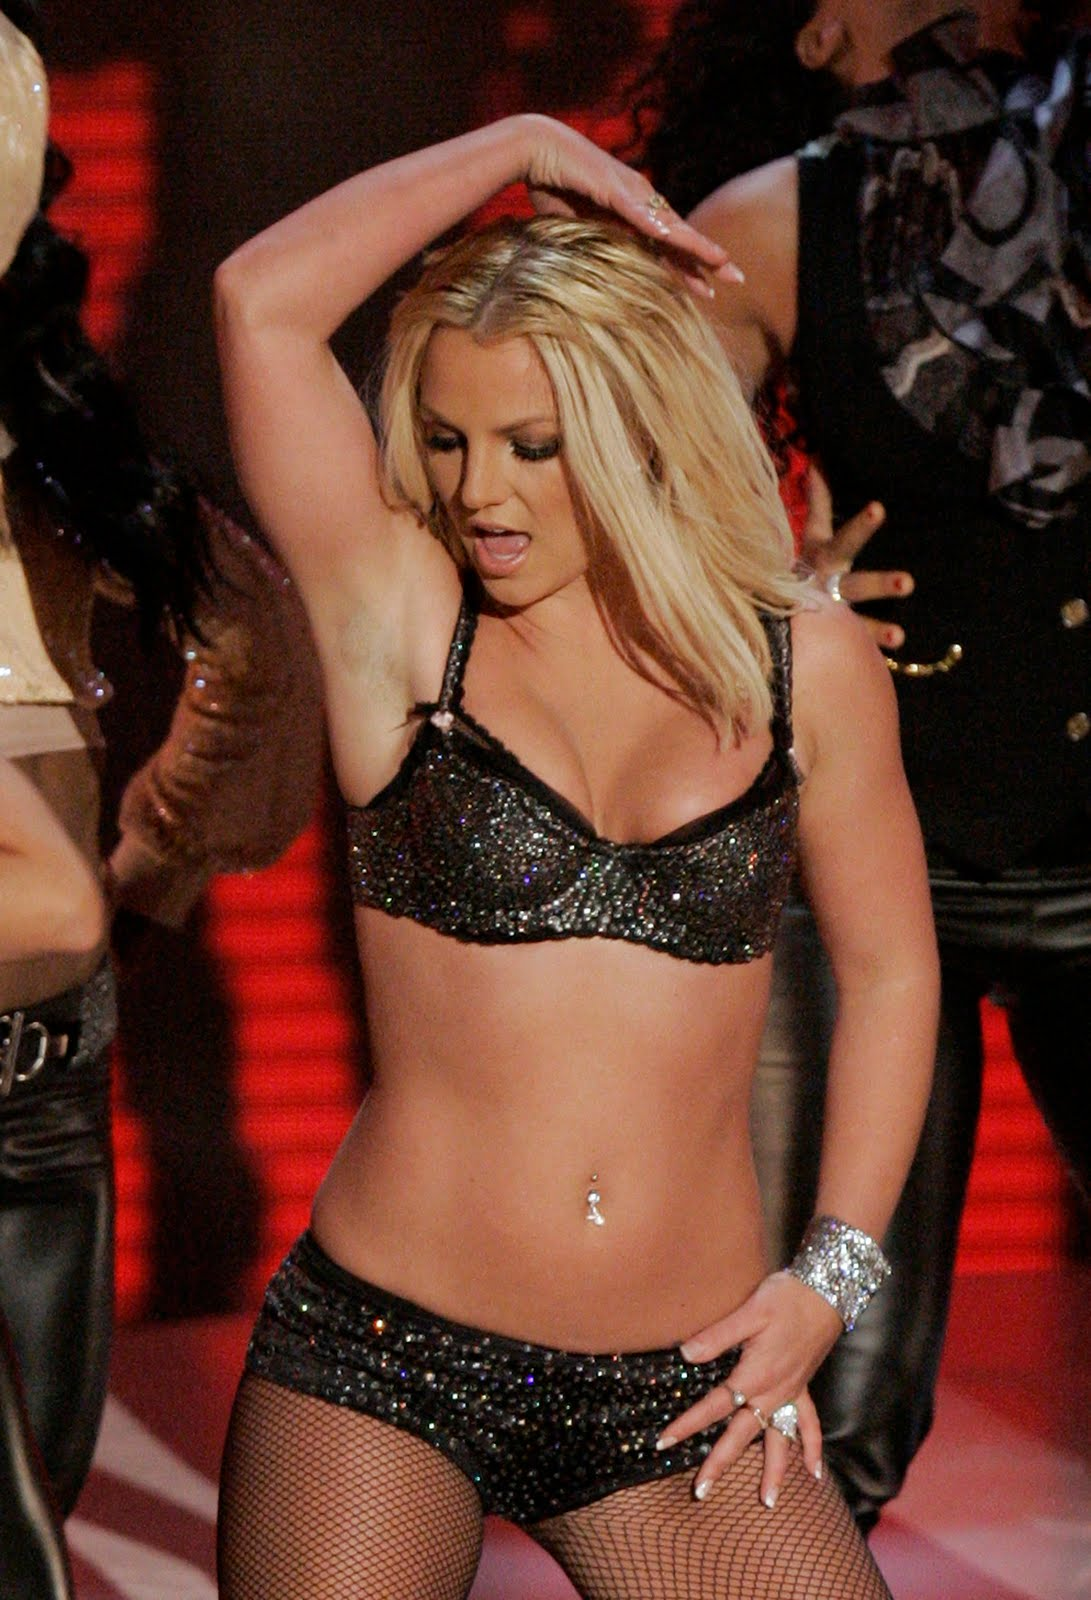 http://1.bp.blogspot.com/_00kZ8gr2iRs/TCpRp_sFKrI/AAAAAAAAANo/gcEEAh5M0vA/s1600/Britney+Spears+Dead.jpg